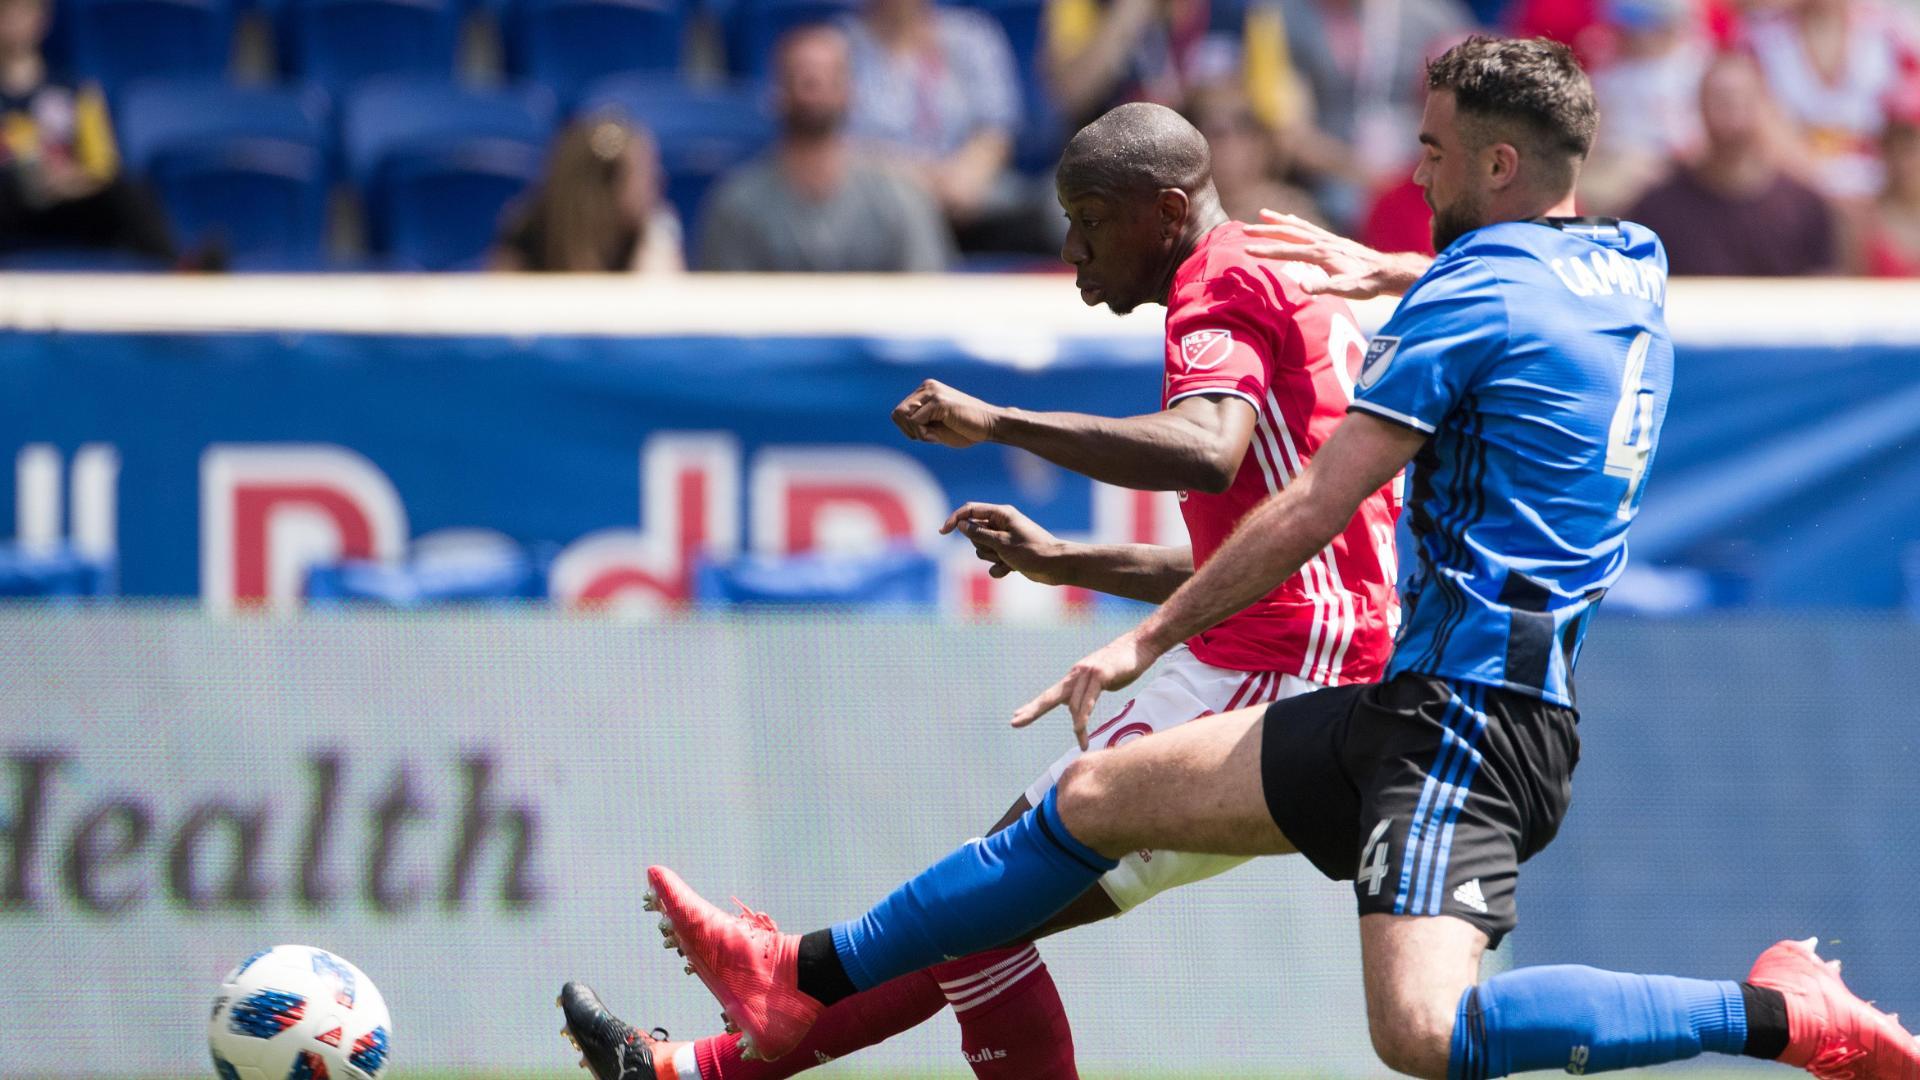 New York 3-1 Montreal: Red Bulls bounce back - Via MLS